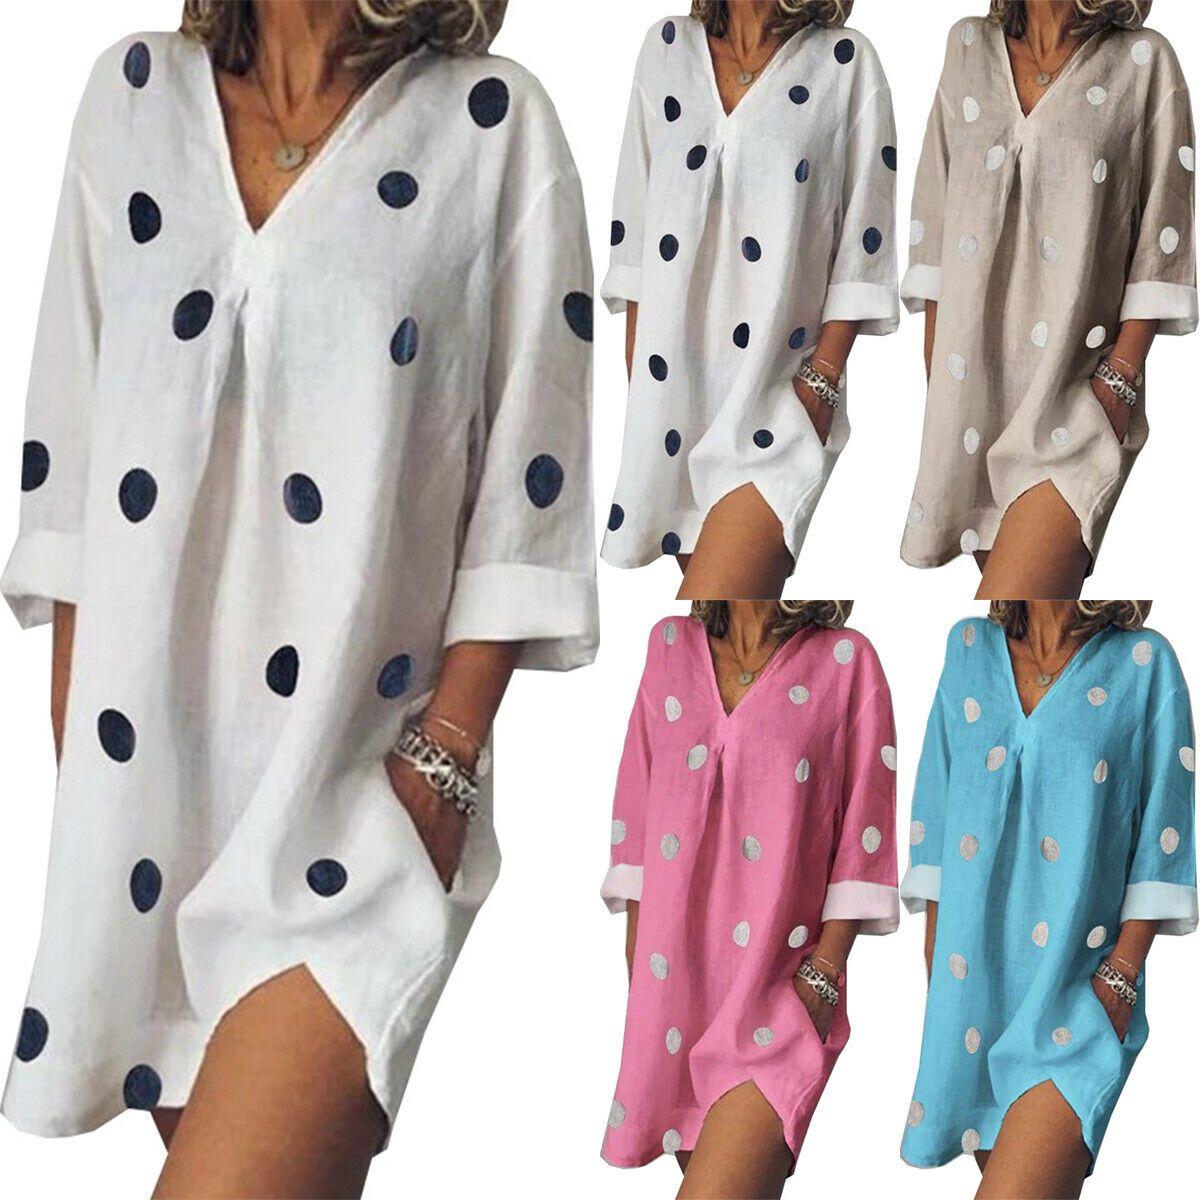 Damen Baumwolle Leinen Minikleid Strandkleid Tunika V-Neck Hemdkleid Longshirt